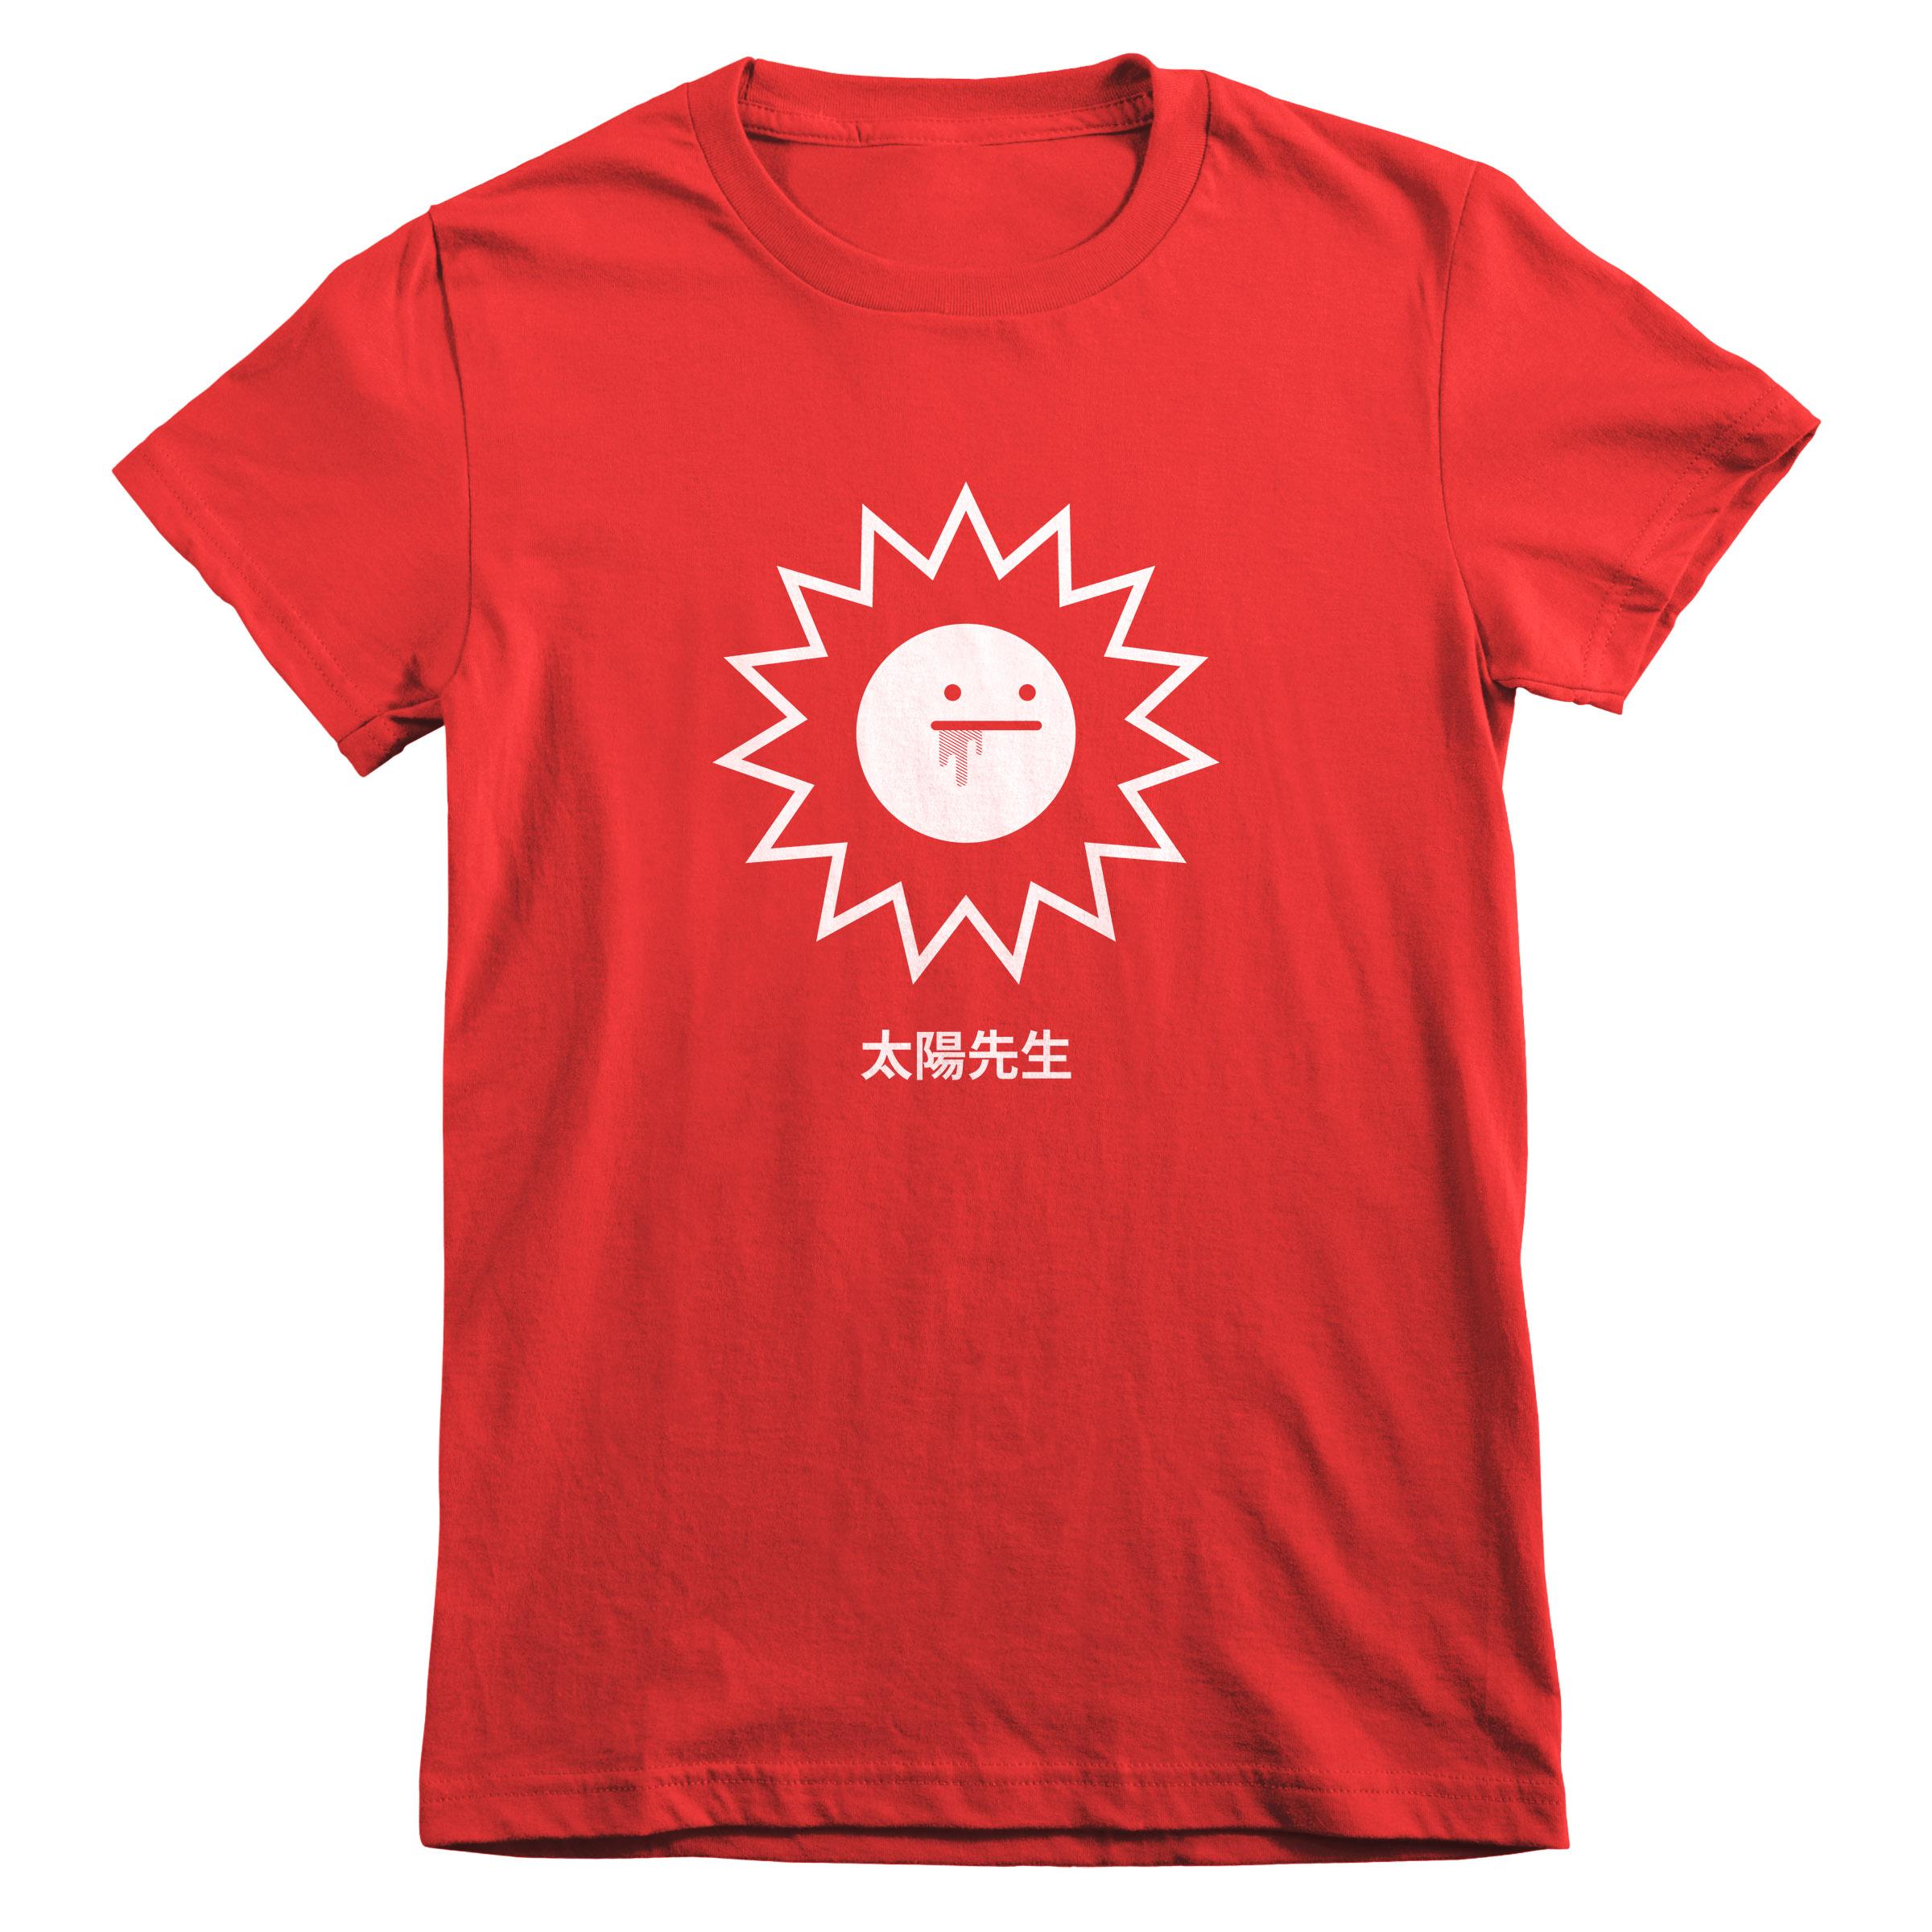 太陽先生 (MR. SUN) T-Shirt (Women s) · wongface · Online Store ... afa14eb14